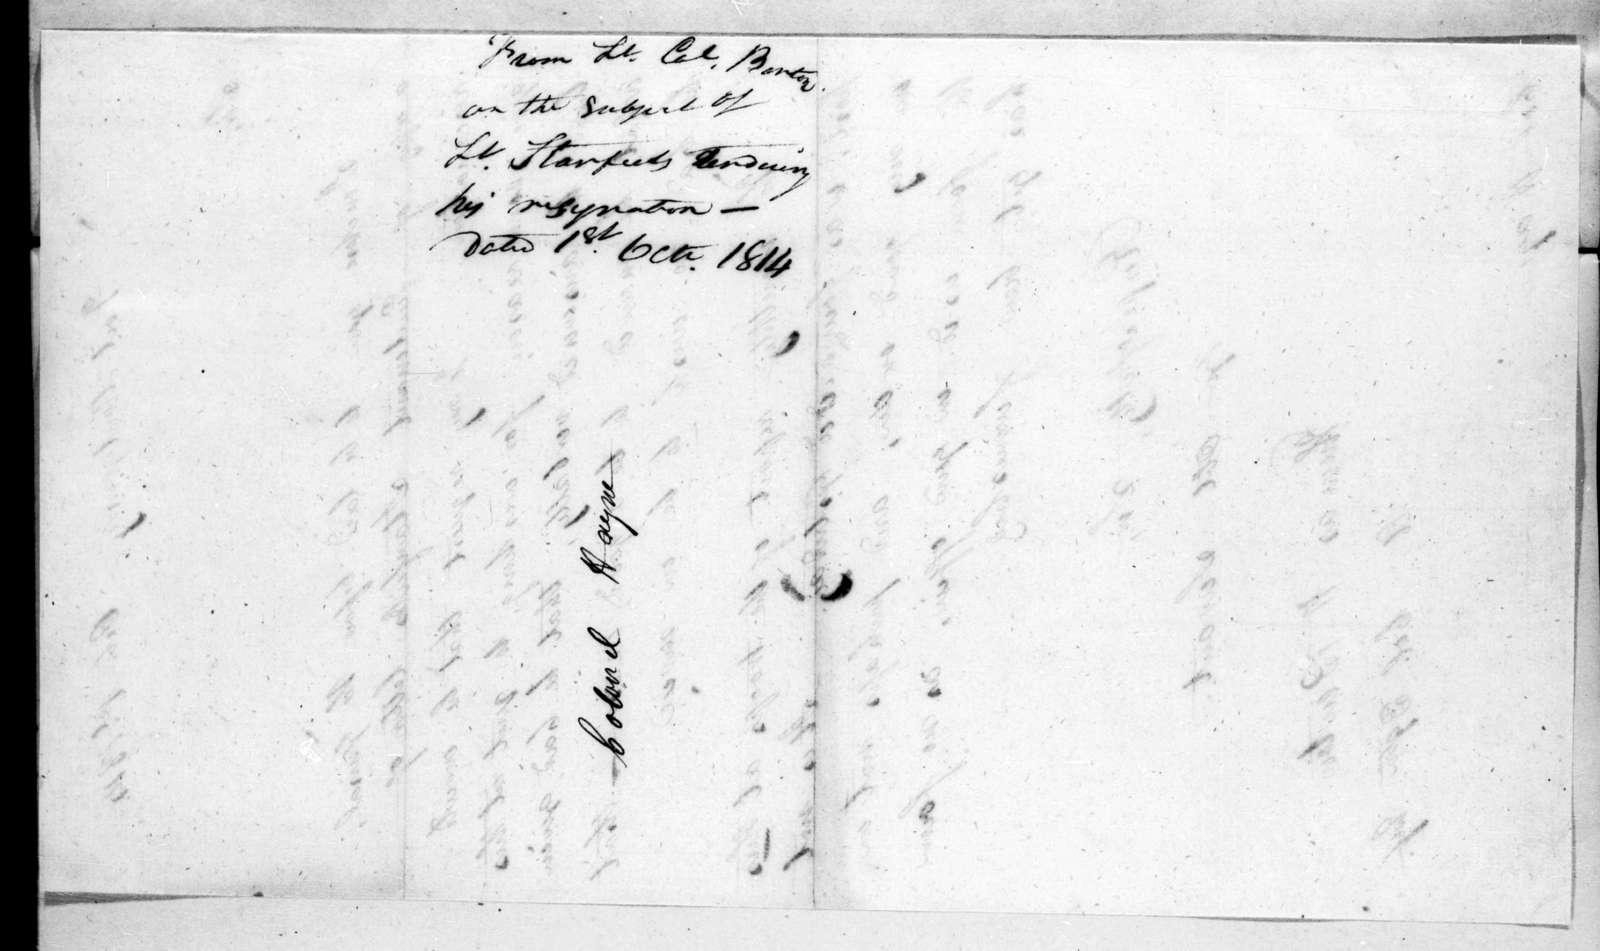 Thomas Hart Benton to Arthur Peronneau Hayne, October 1, 1814